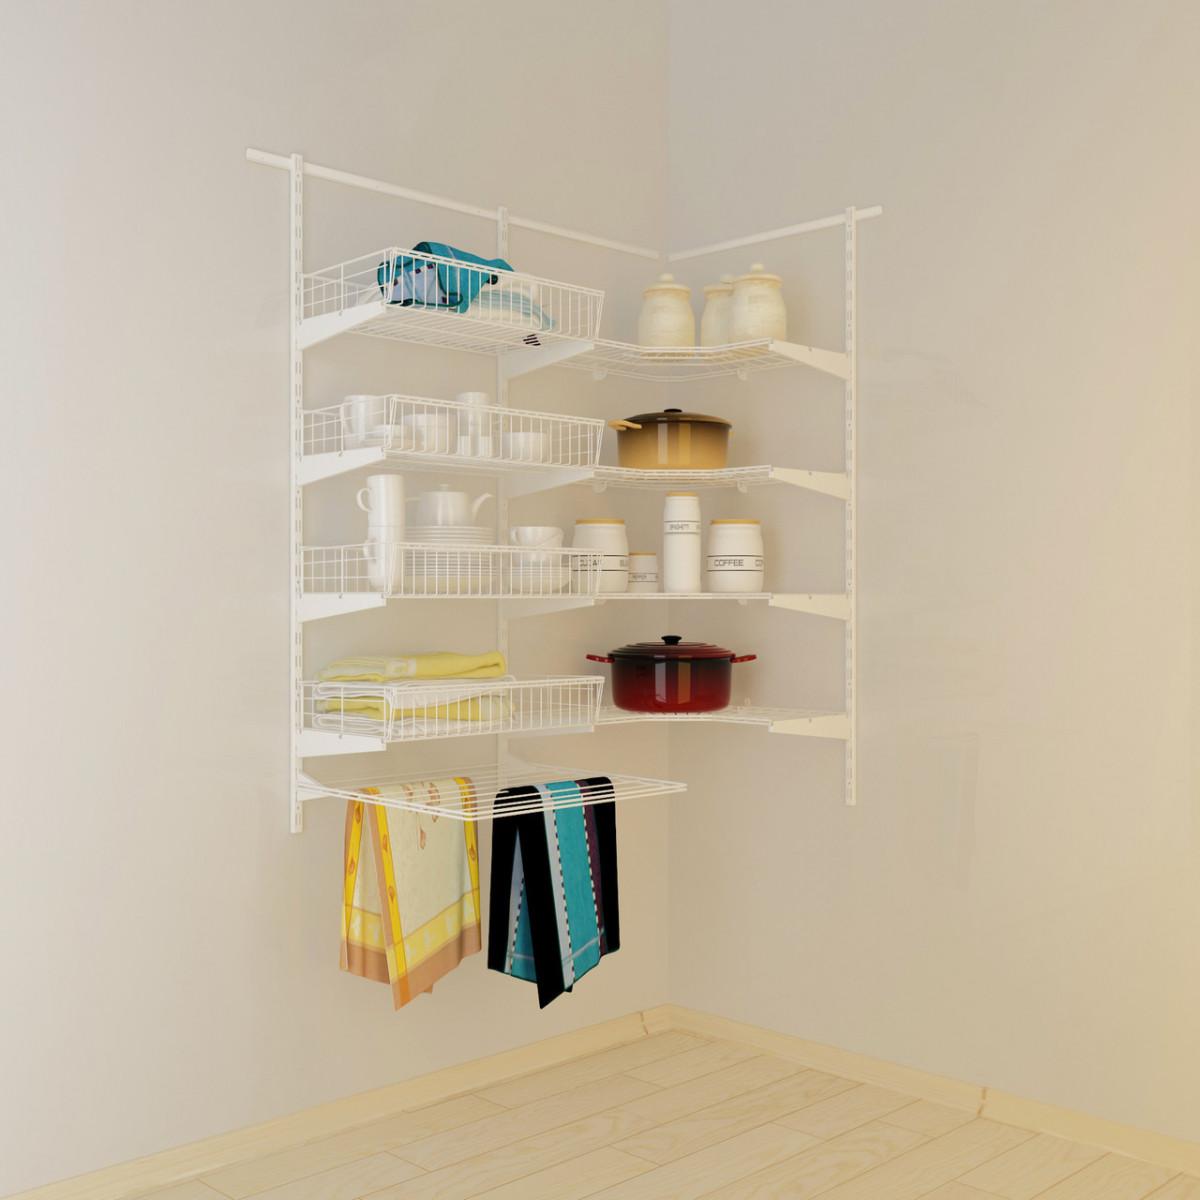 Кутова гардеробна система Кольчуга Система зберігання (консоль, стелаж)